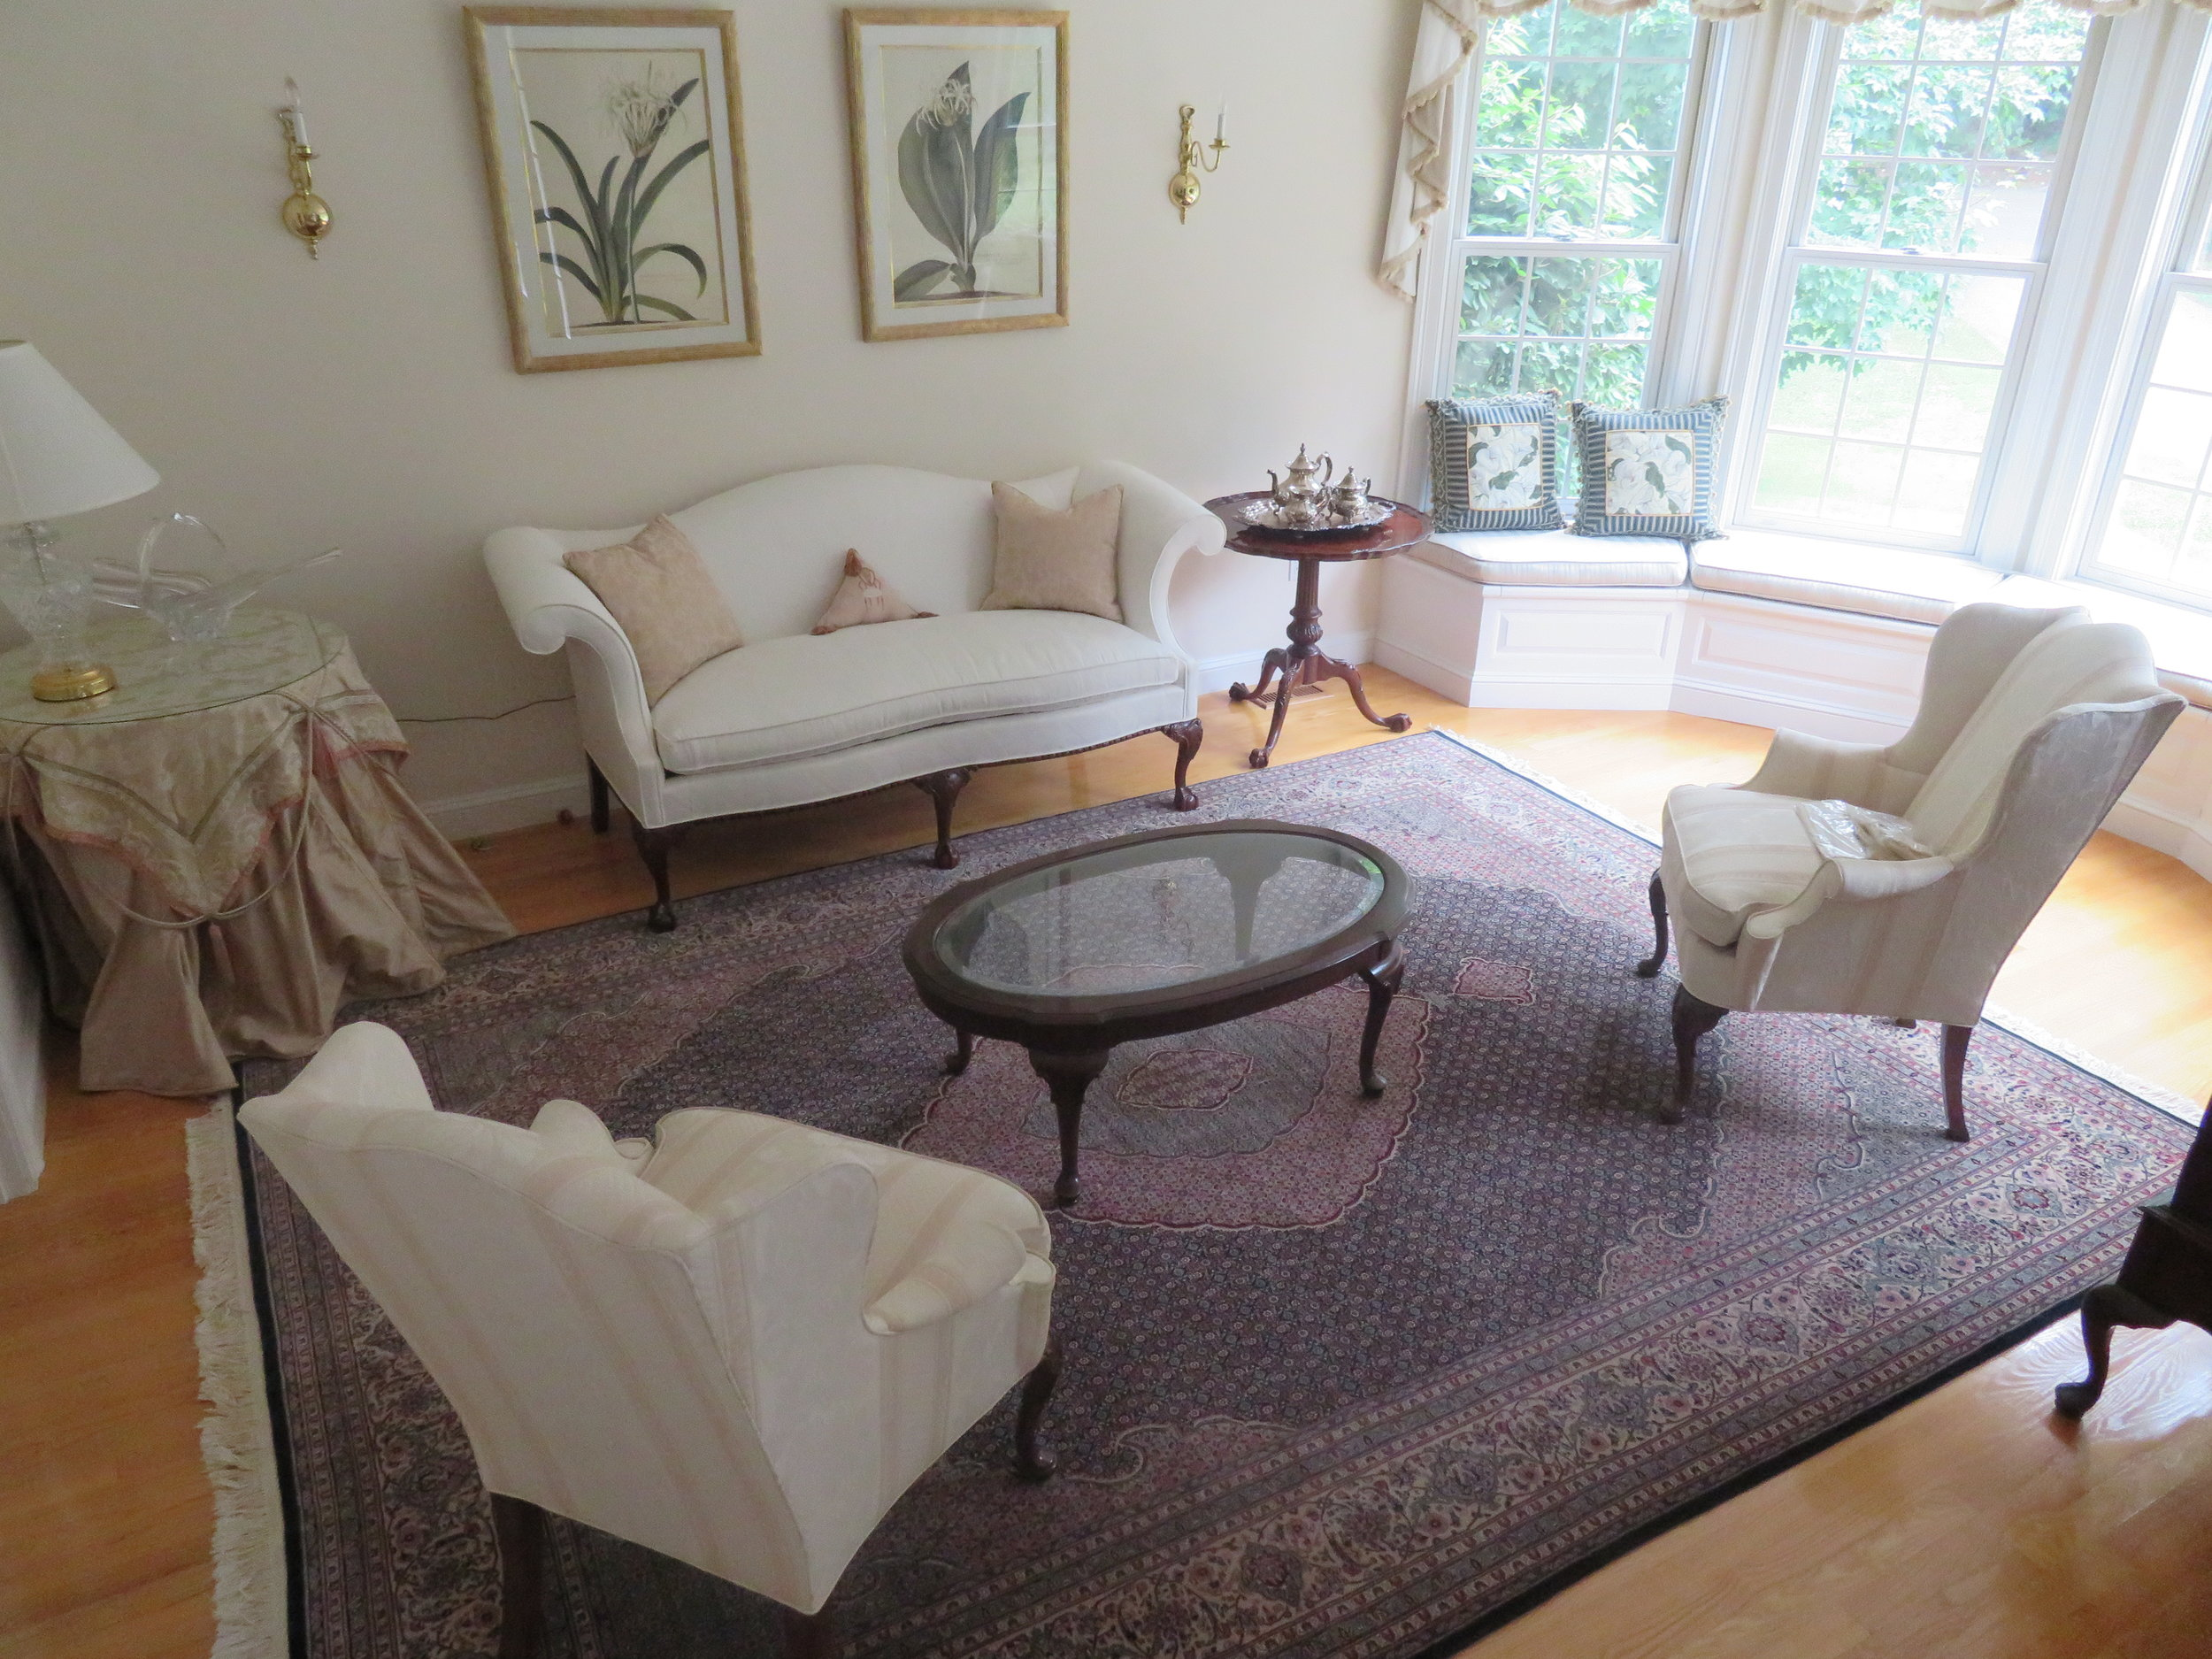 Dover 2-Day Sale - Contents of 5-bedroom picturesquecustom built Dover EstateSept. 14-15, 2018